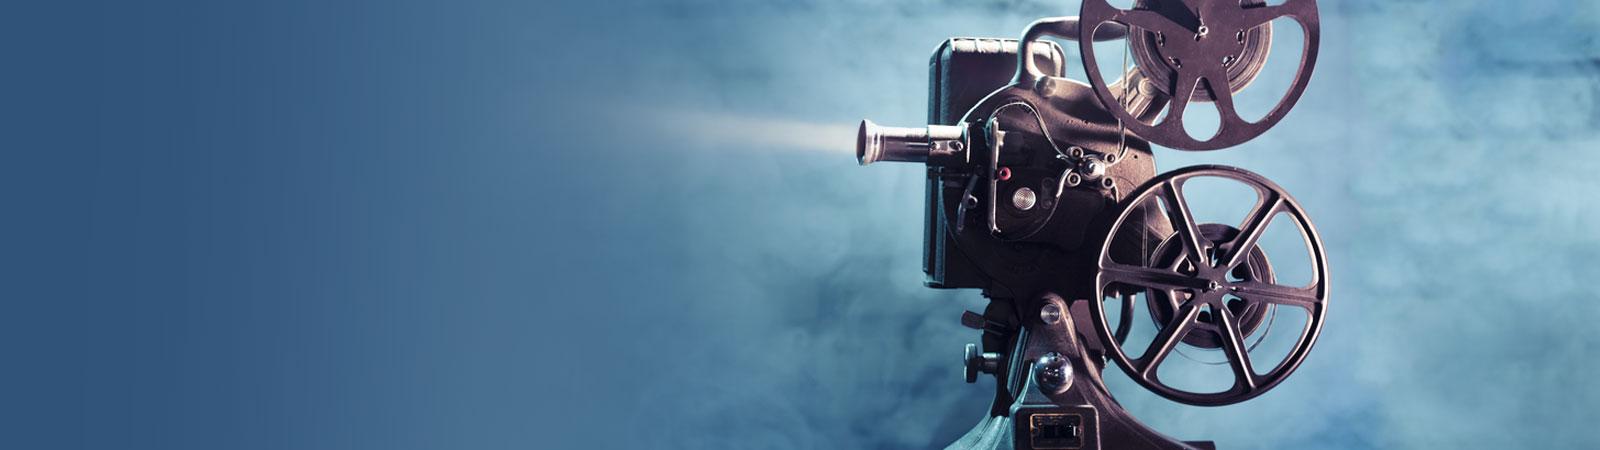 Nezumi Voiture Teaser – Great Watch Lighting